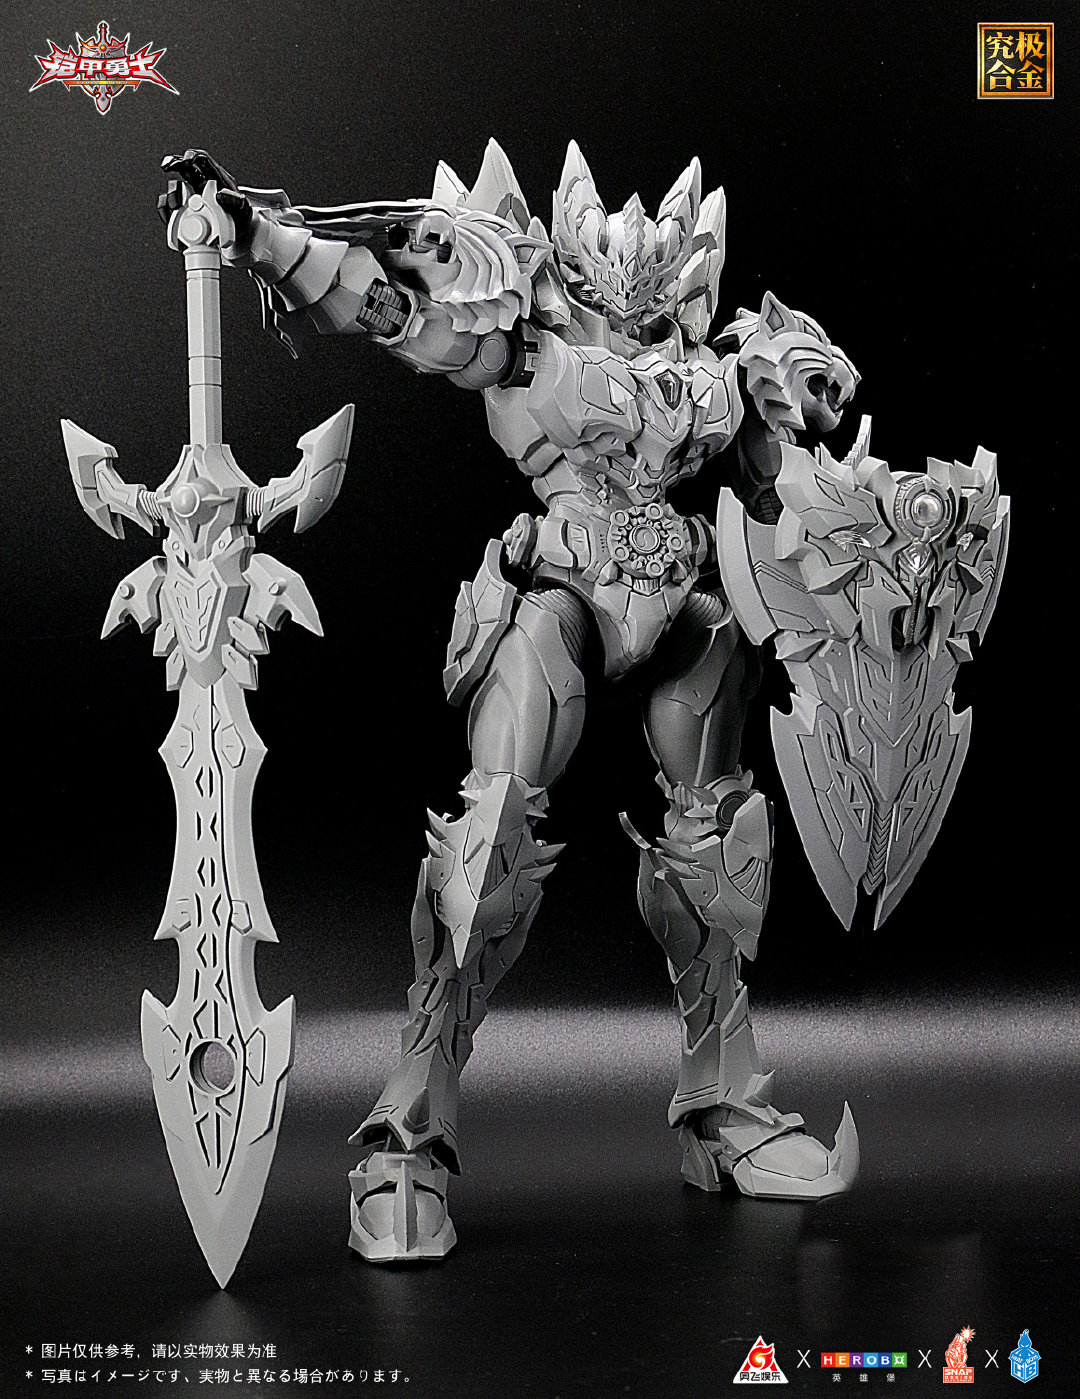 S535_Armor_hero_Emperor_021.jpg